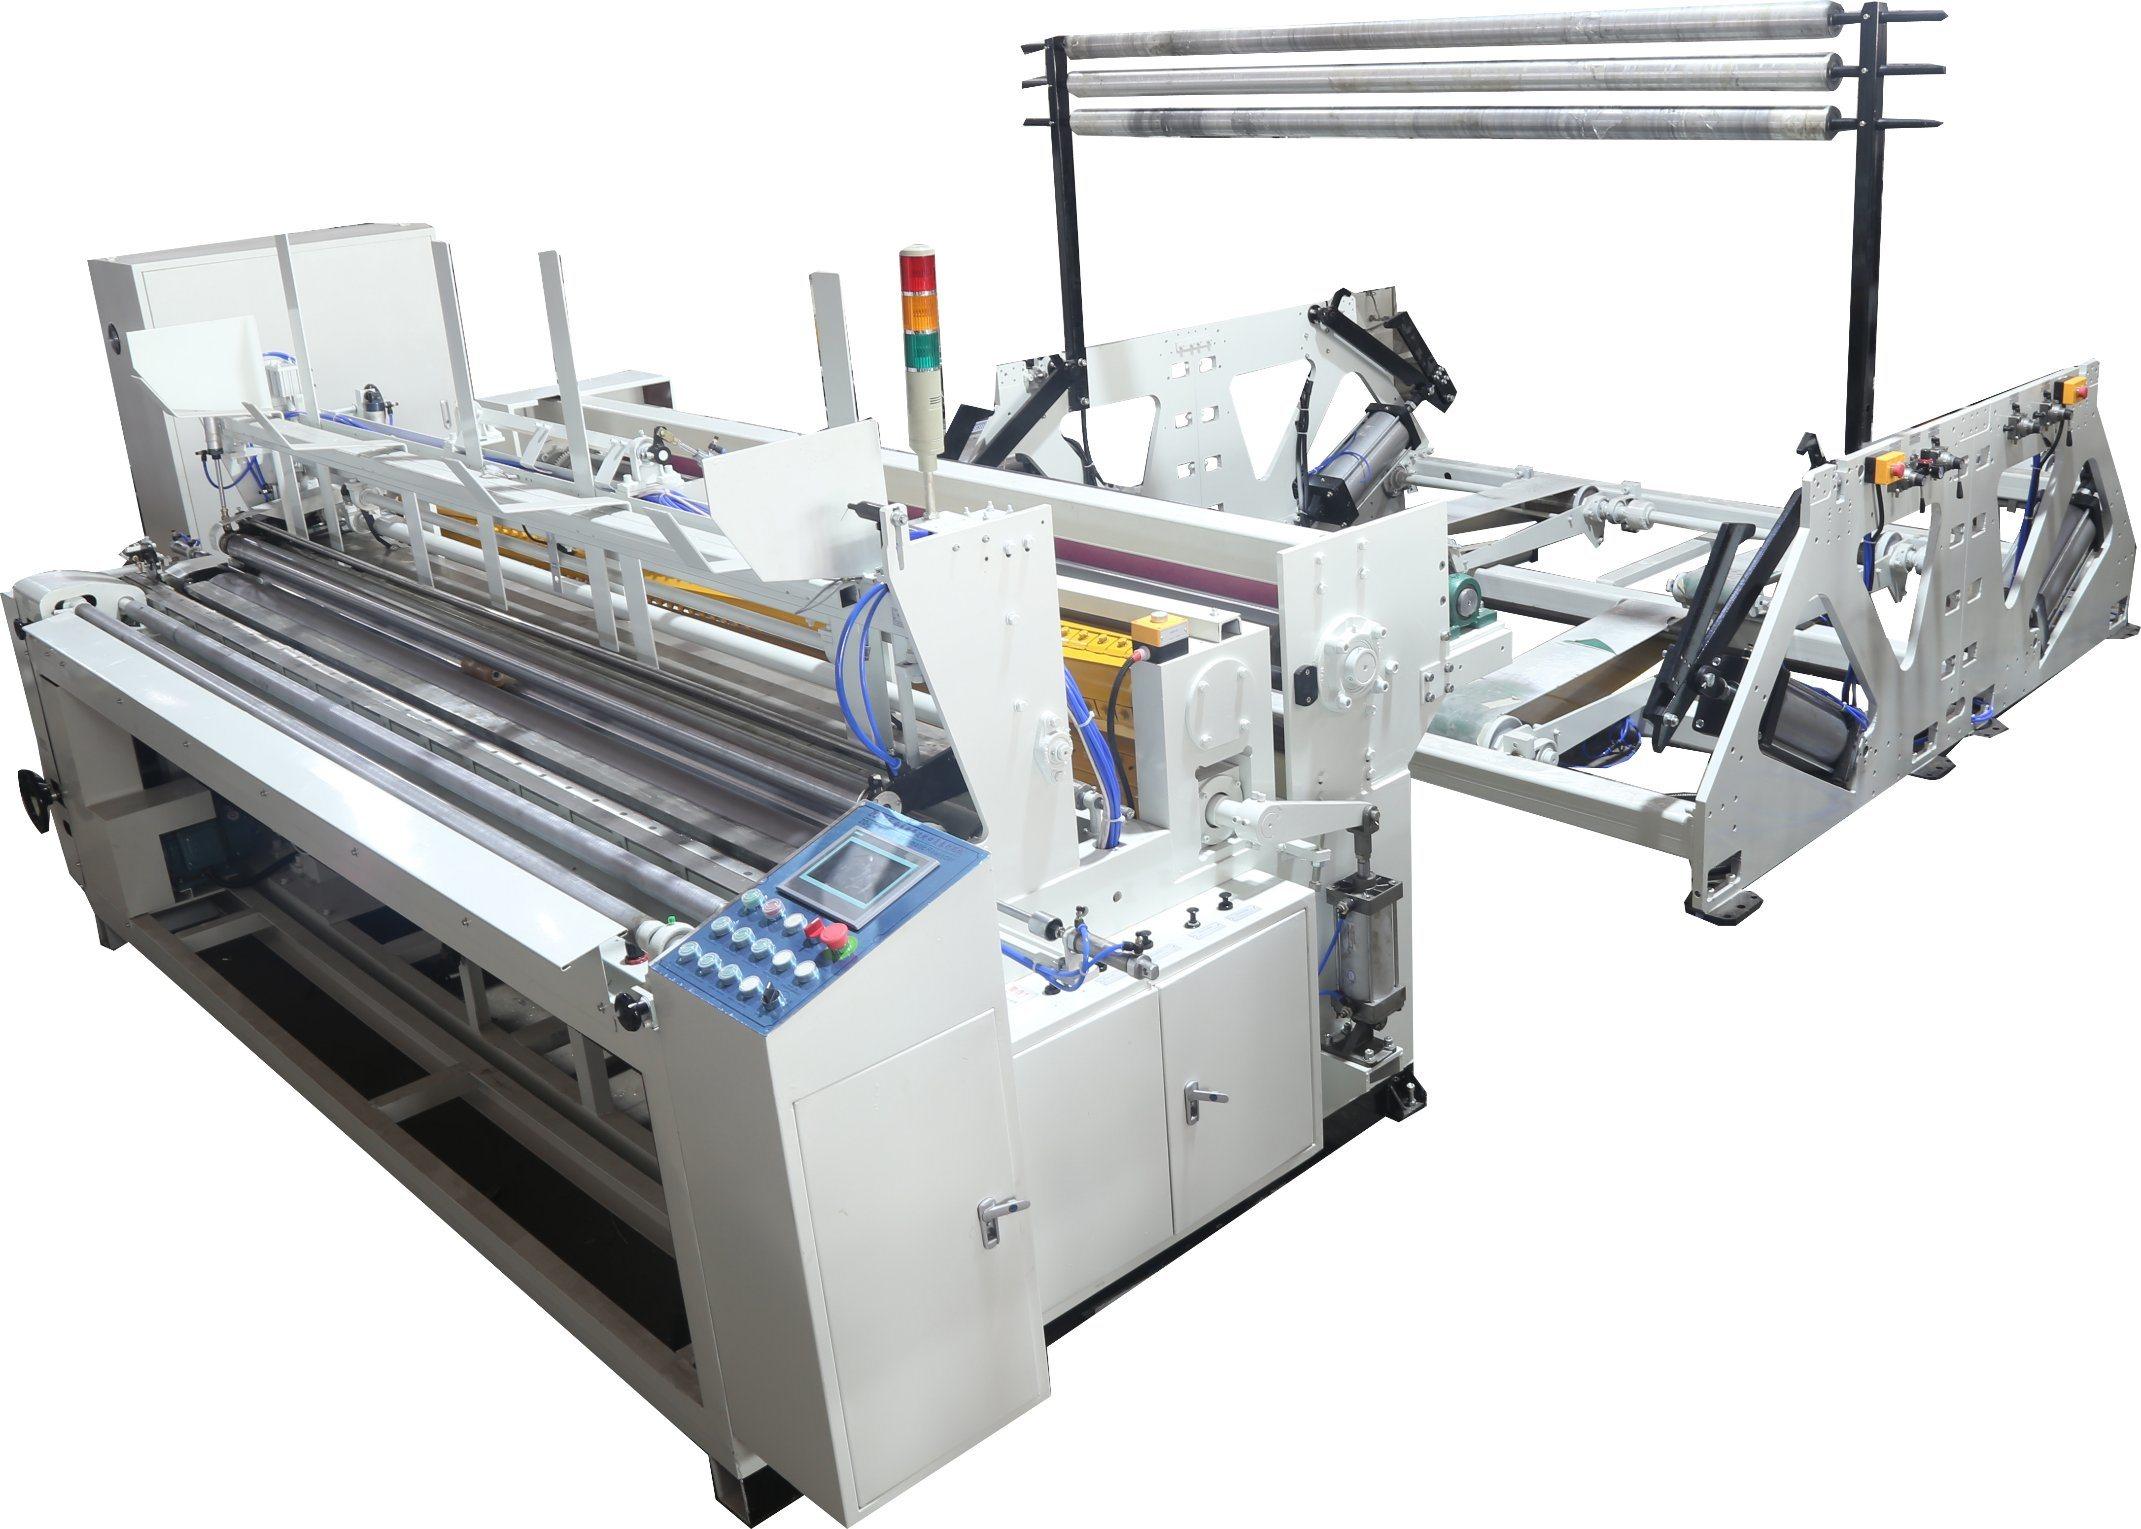 Automatic Rewinding Jumbo Roll Toilet Paper Making Machine/ Jrt Rewinder Machine